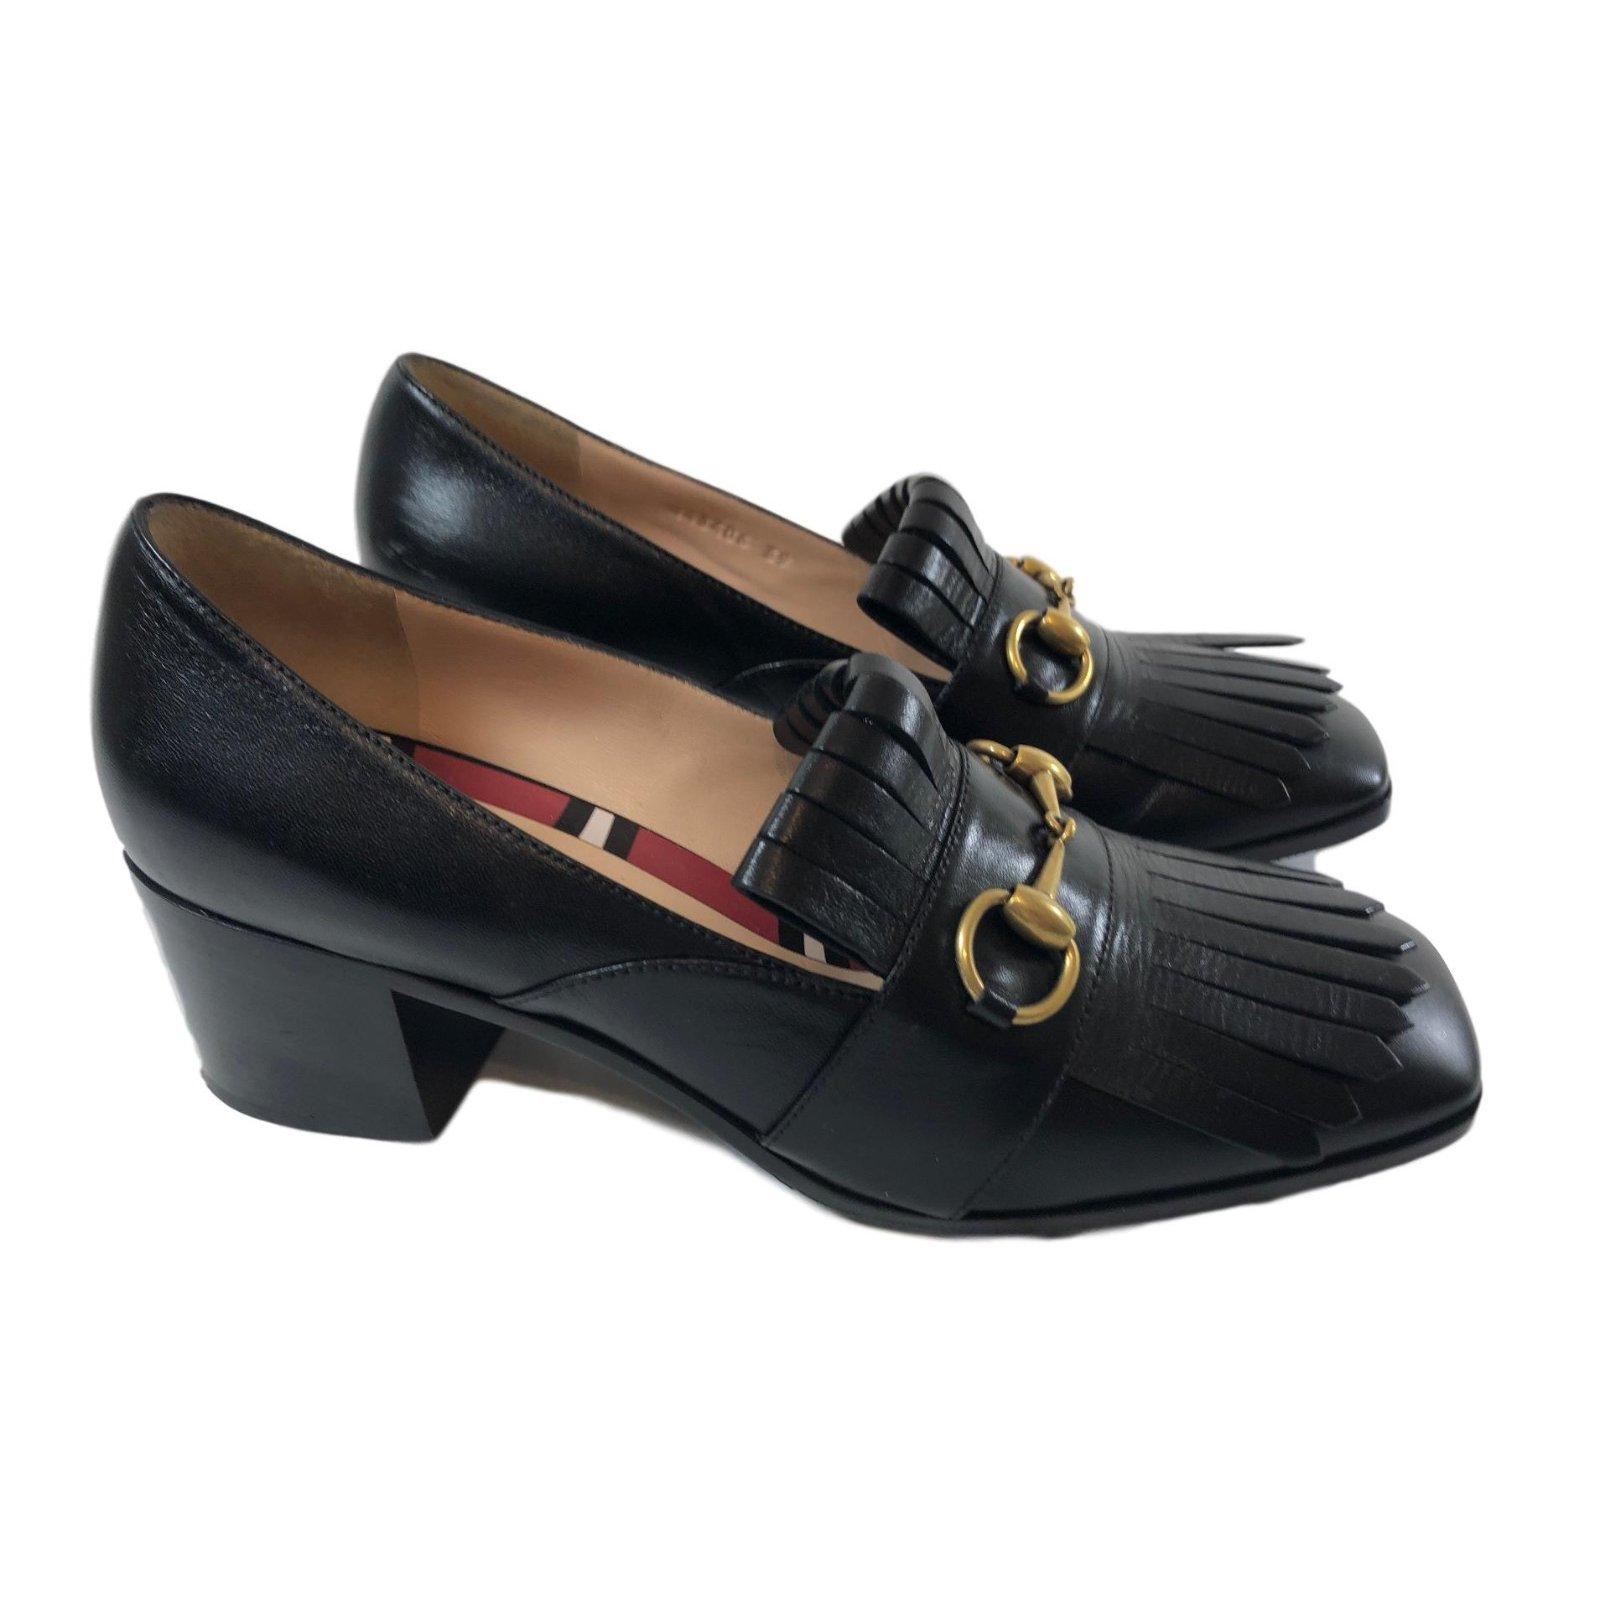 8da8faaba241 Gucci Loafers Flats Leather Black ref.68679 - Joli Closet